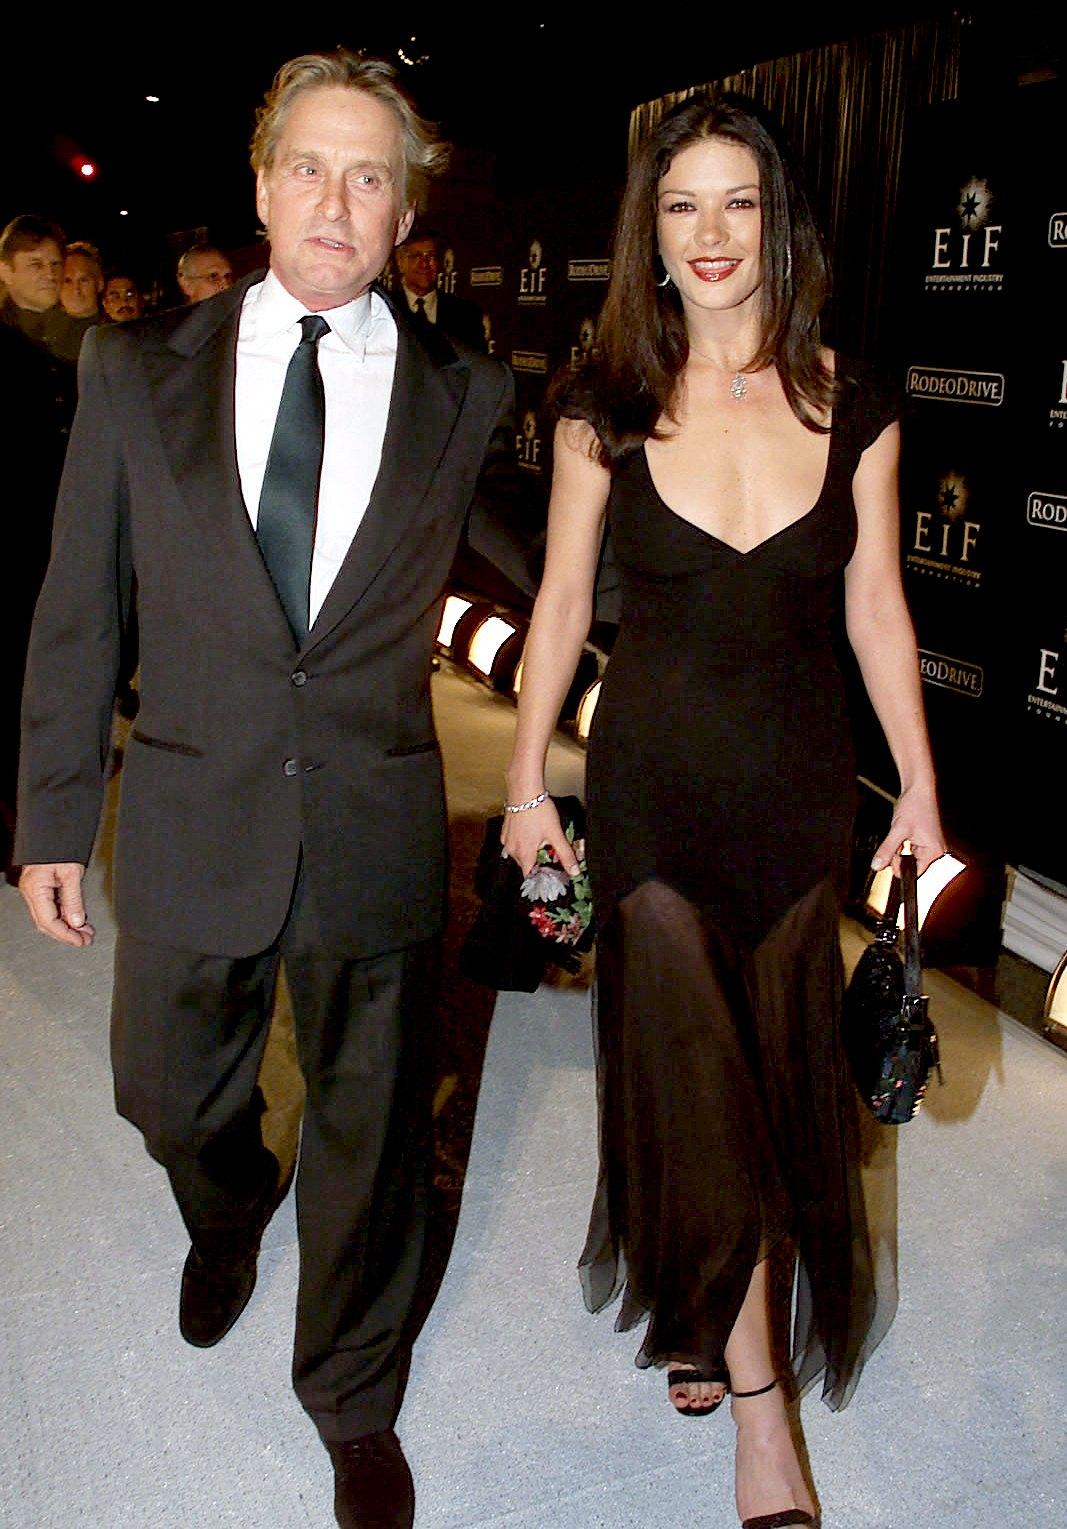 Michael-Douglas-and-Catherine-Zeta-Jones-2-November-1999-pregnancy